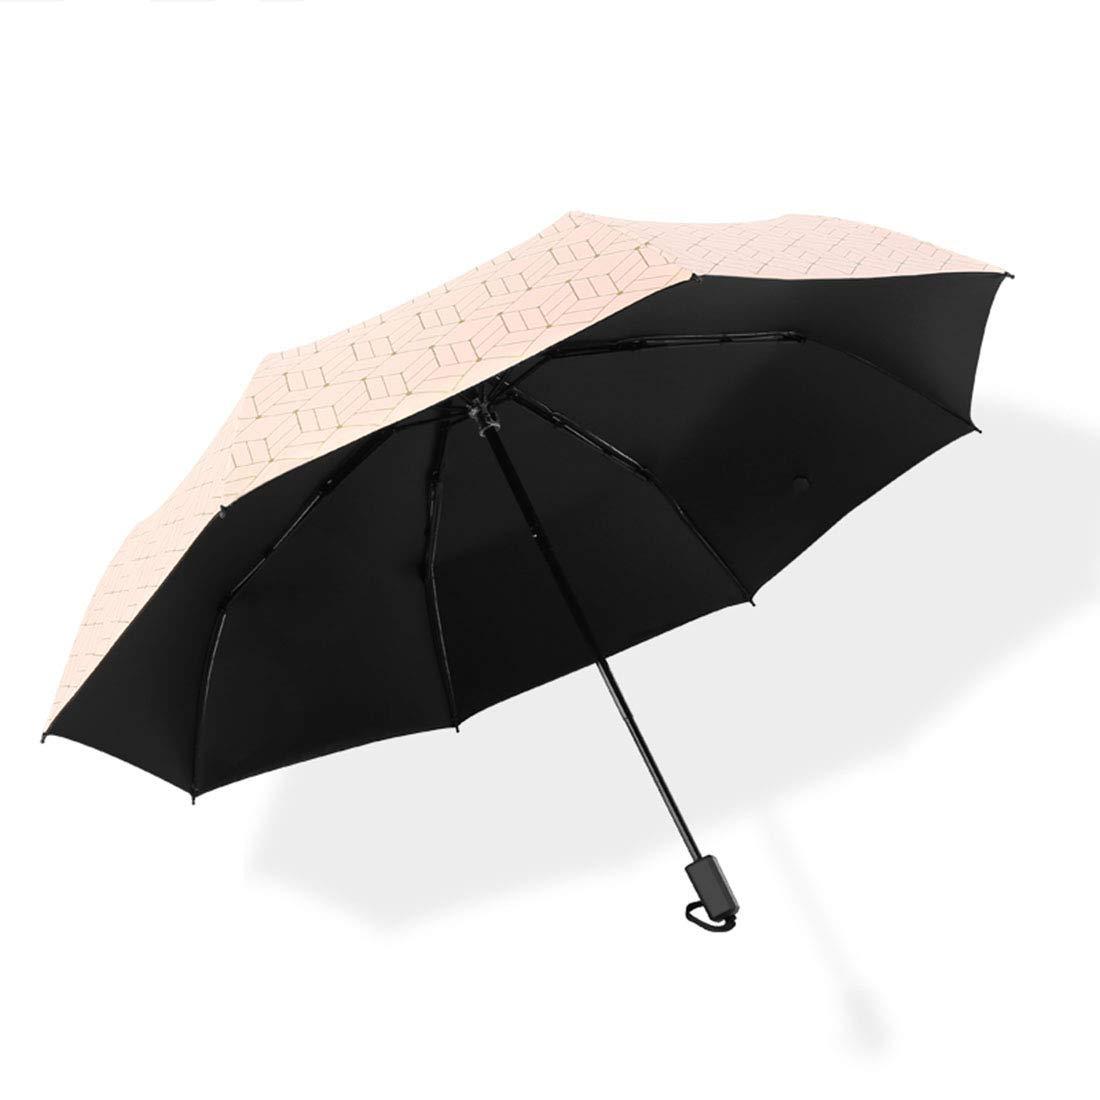 BAOLH Umbrellas Compact Folding Travel Umbrella UV Protection Sunscreen Parasol (Color : Pink)